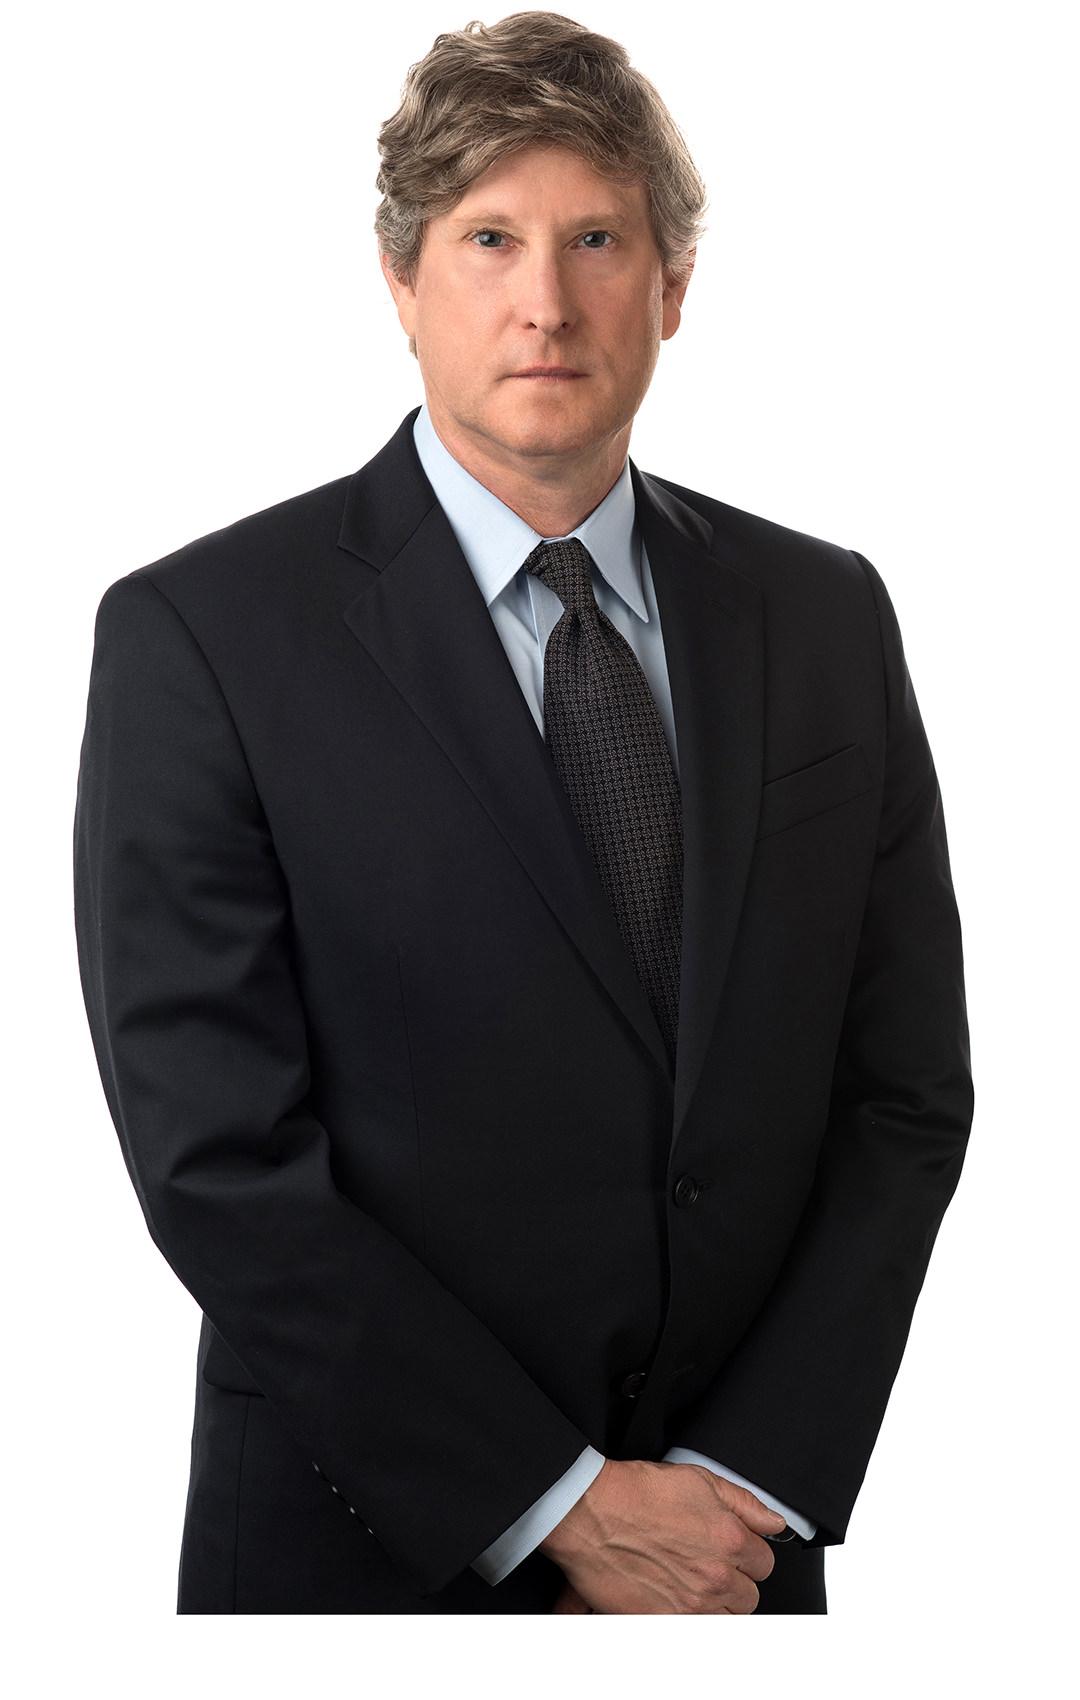 J. Mark Jones